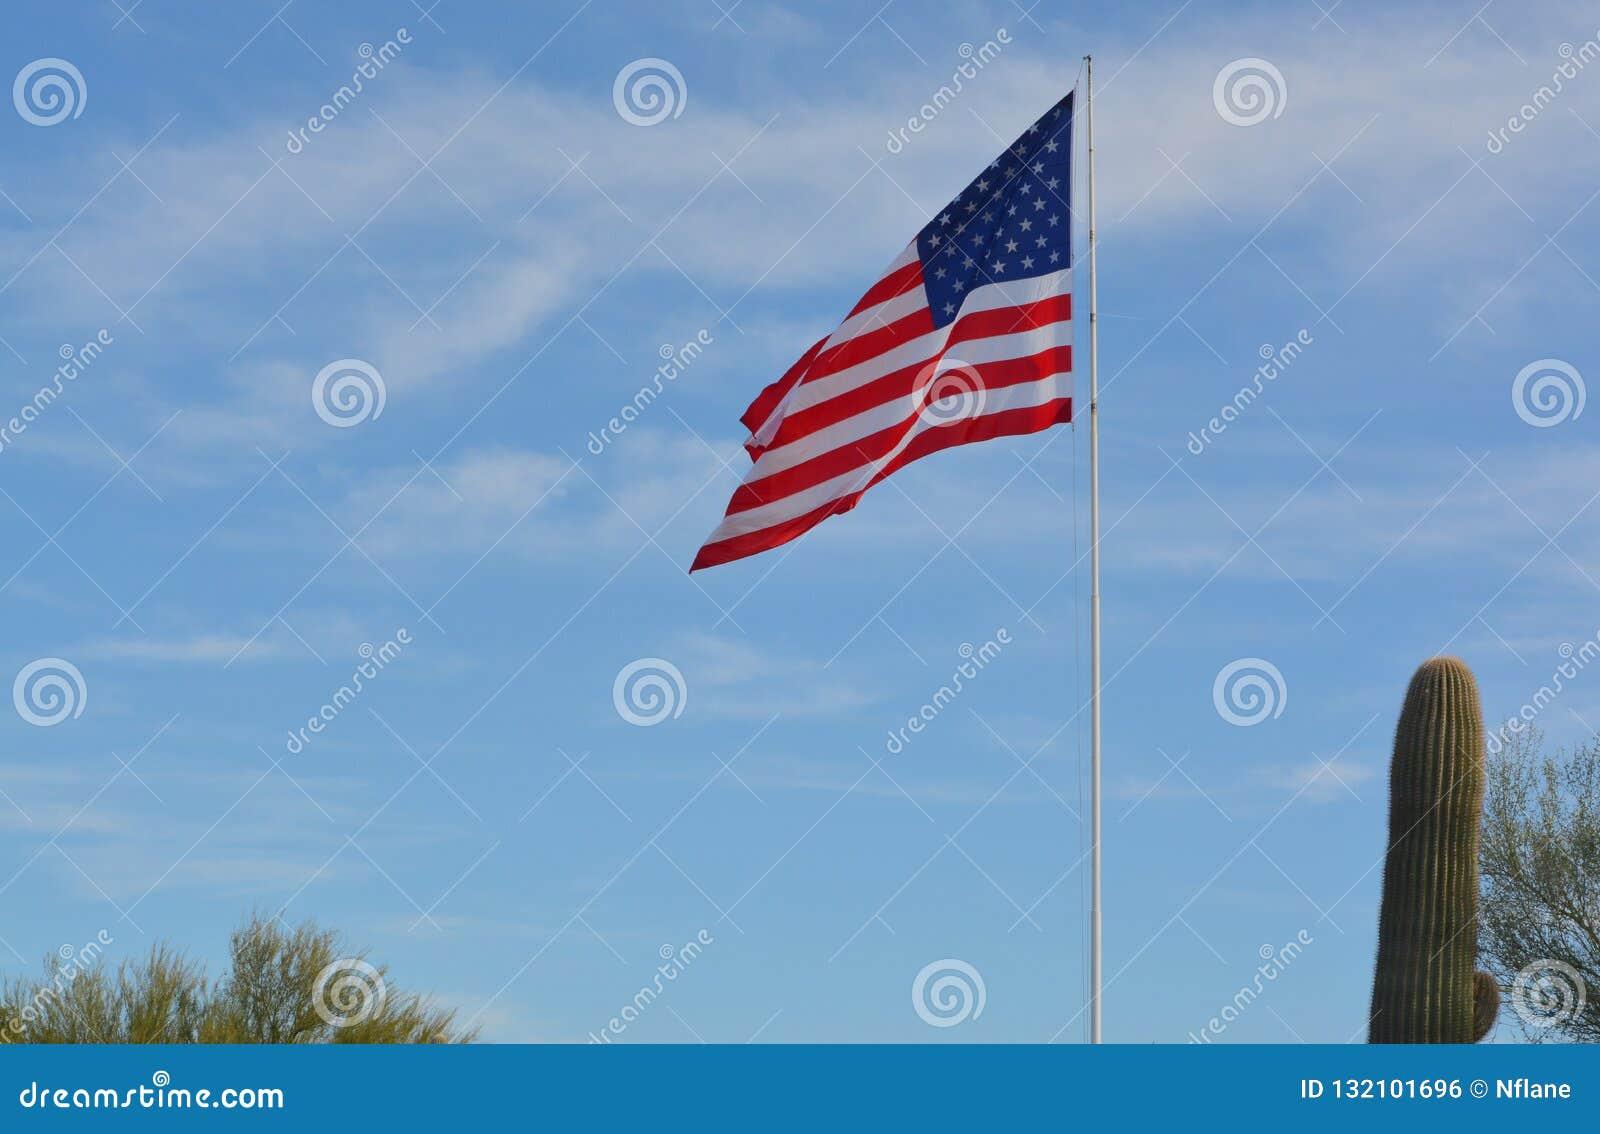 Flagge Vereinigter Staaten nahe bei einem Saguarokaktus, Höhlen-Nebenfluss, Maricopa County, Arizona, USA